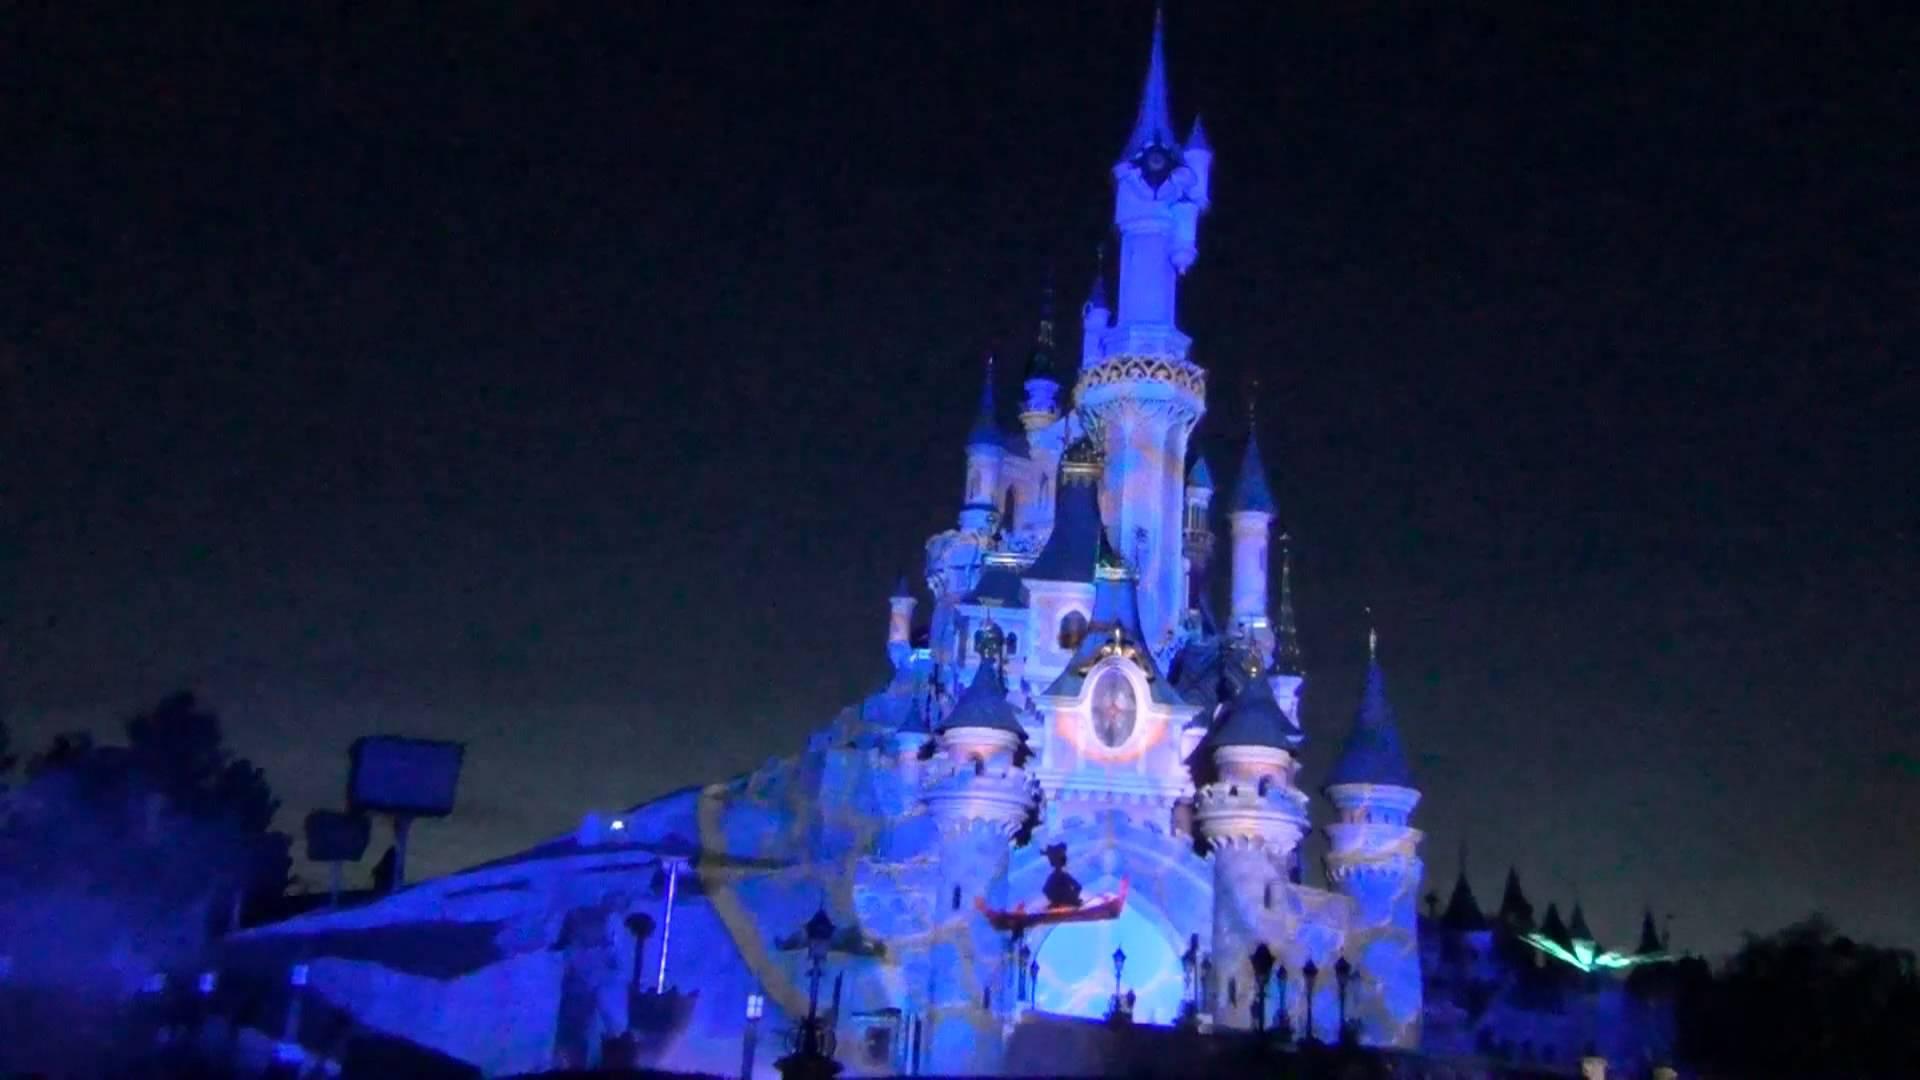 Cozy Fall Wallpaper Hd Disneyland Backgrounds Pixelstalk Net